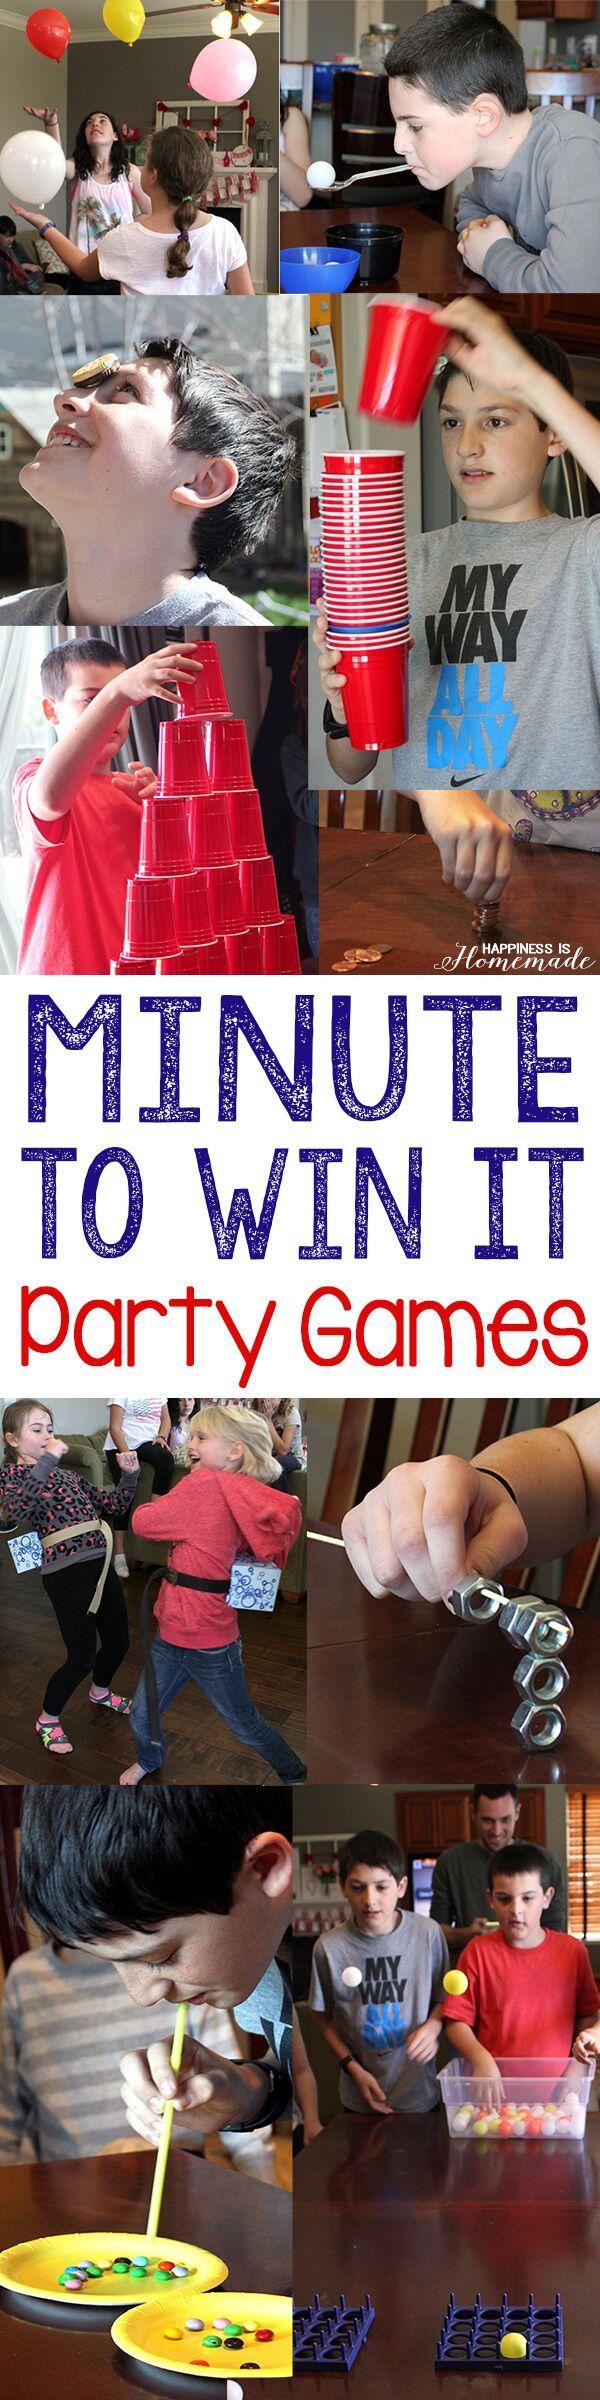 The Best Party Decor Ideas on Pinterest! - Princess Pinky Girl